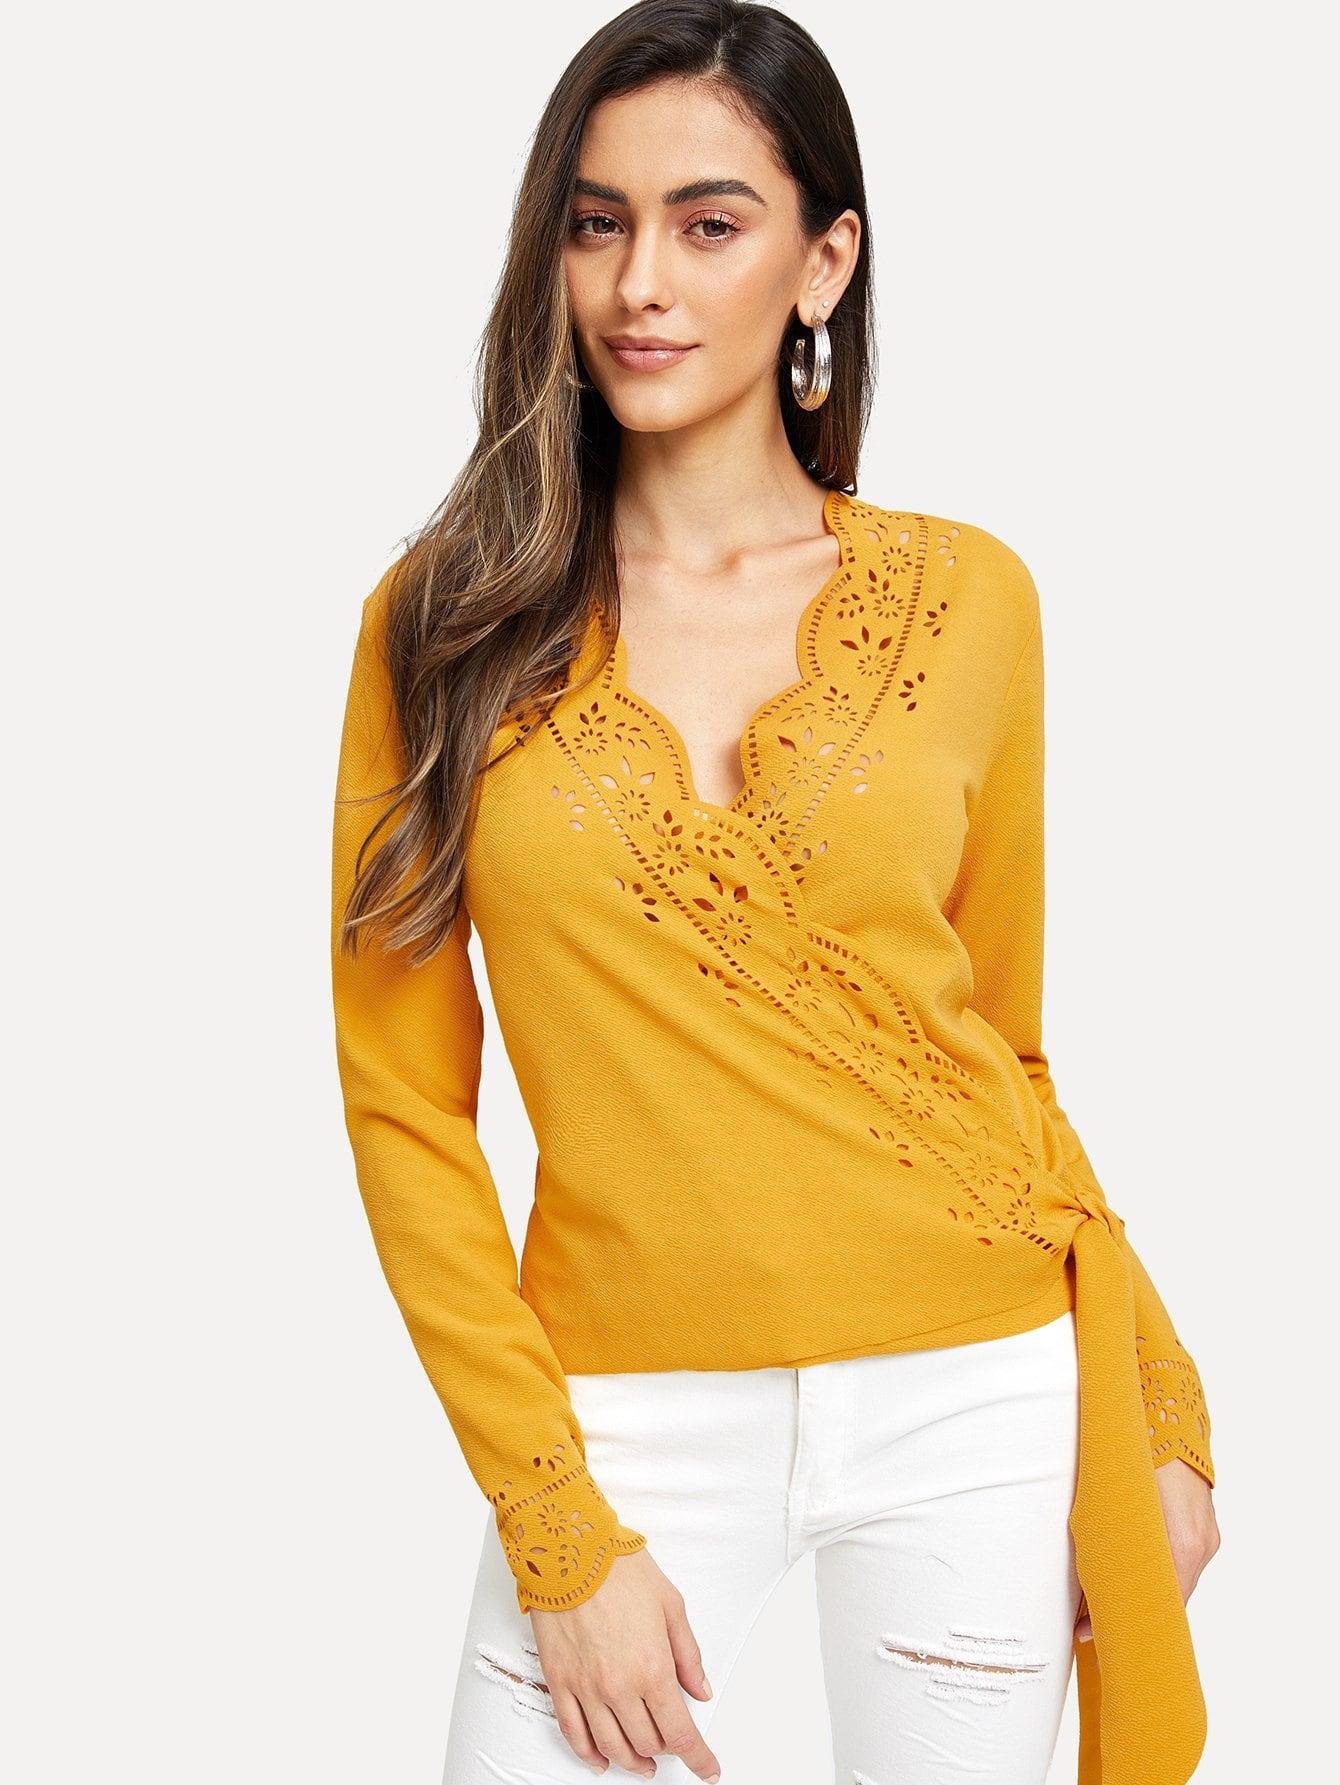 Фото - Гребешок лазерная резка блузка от SheIn желтого цвета